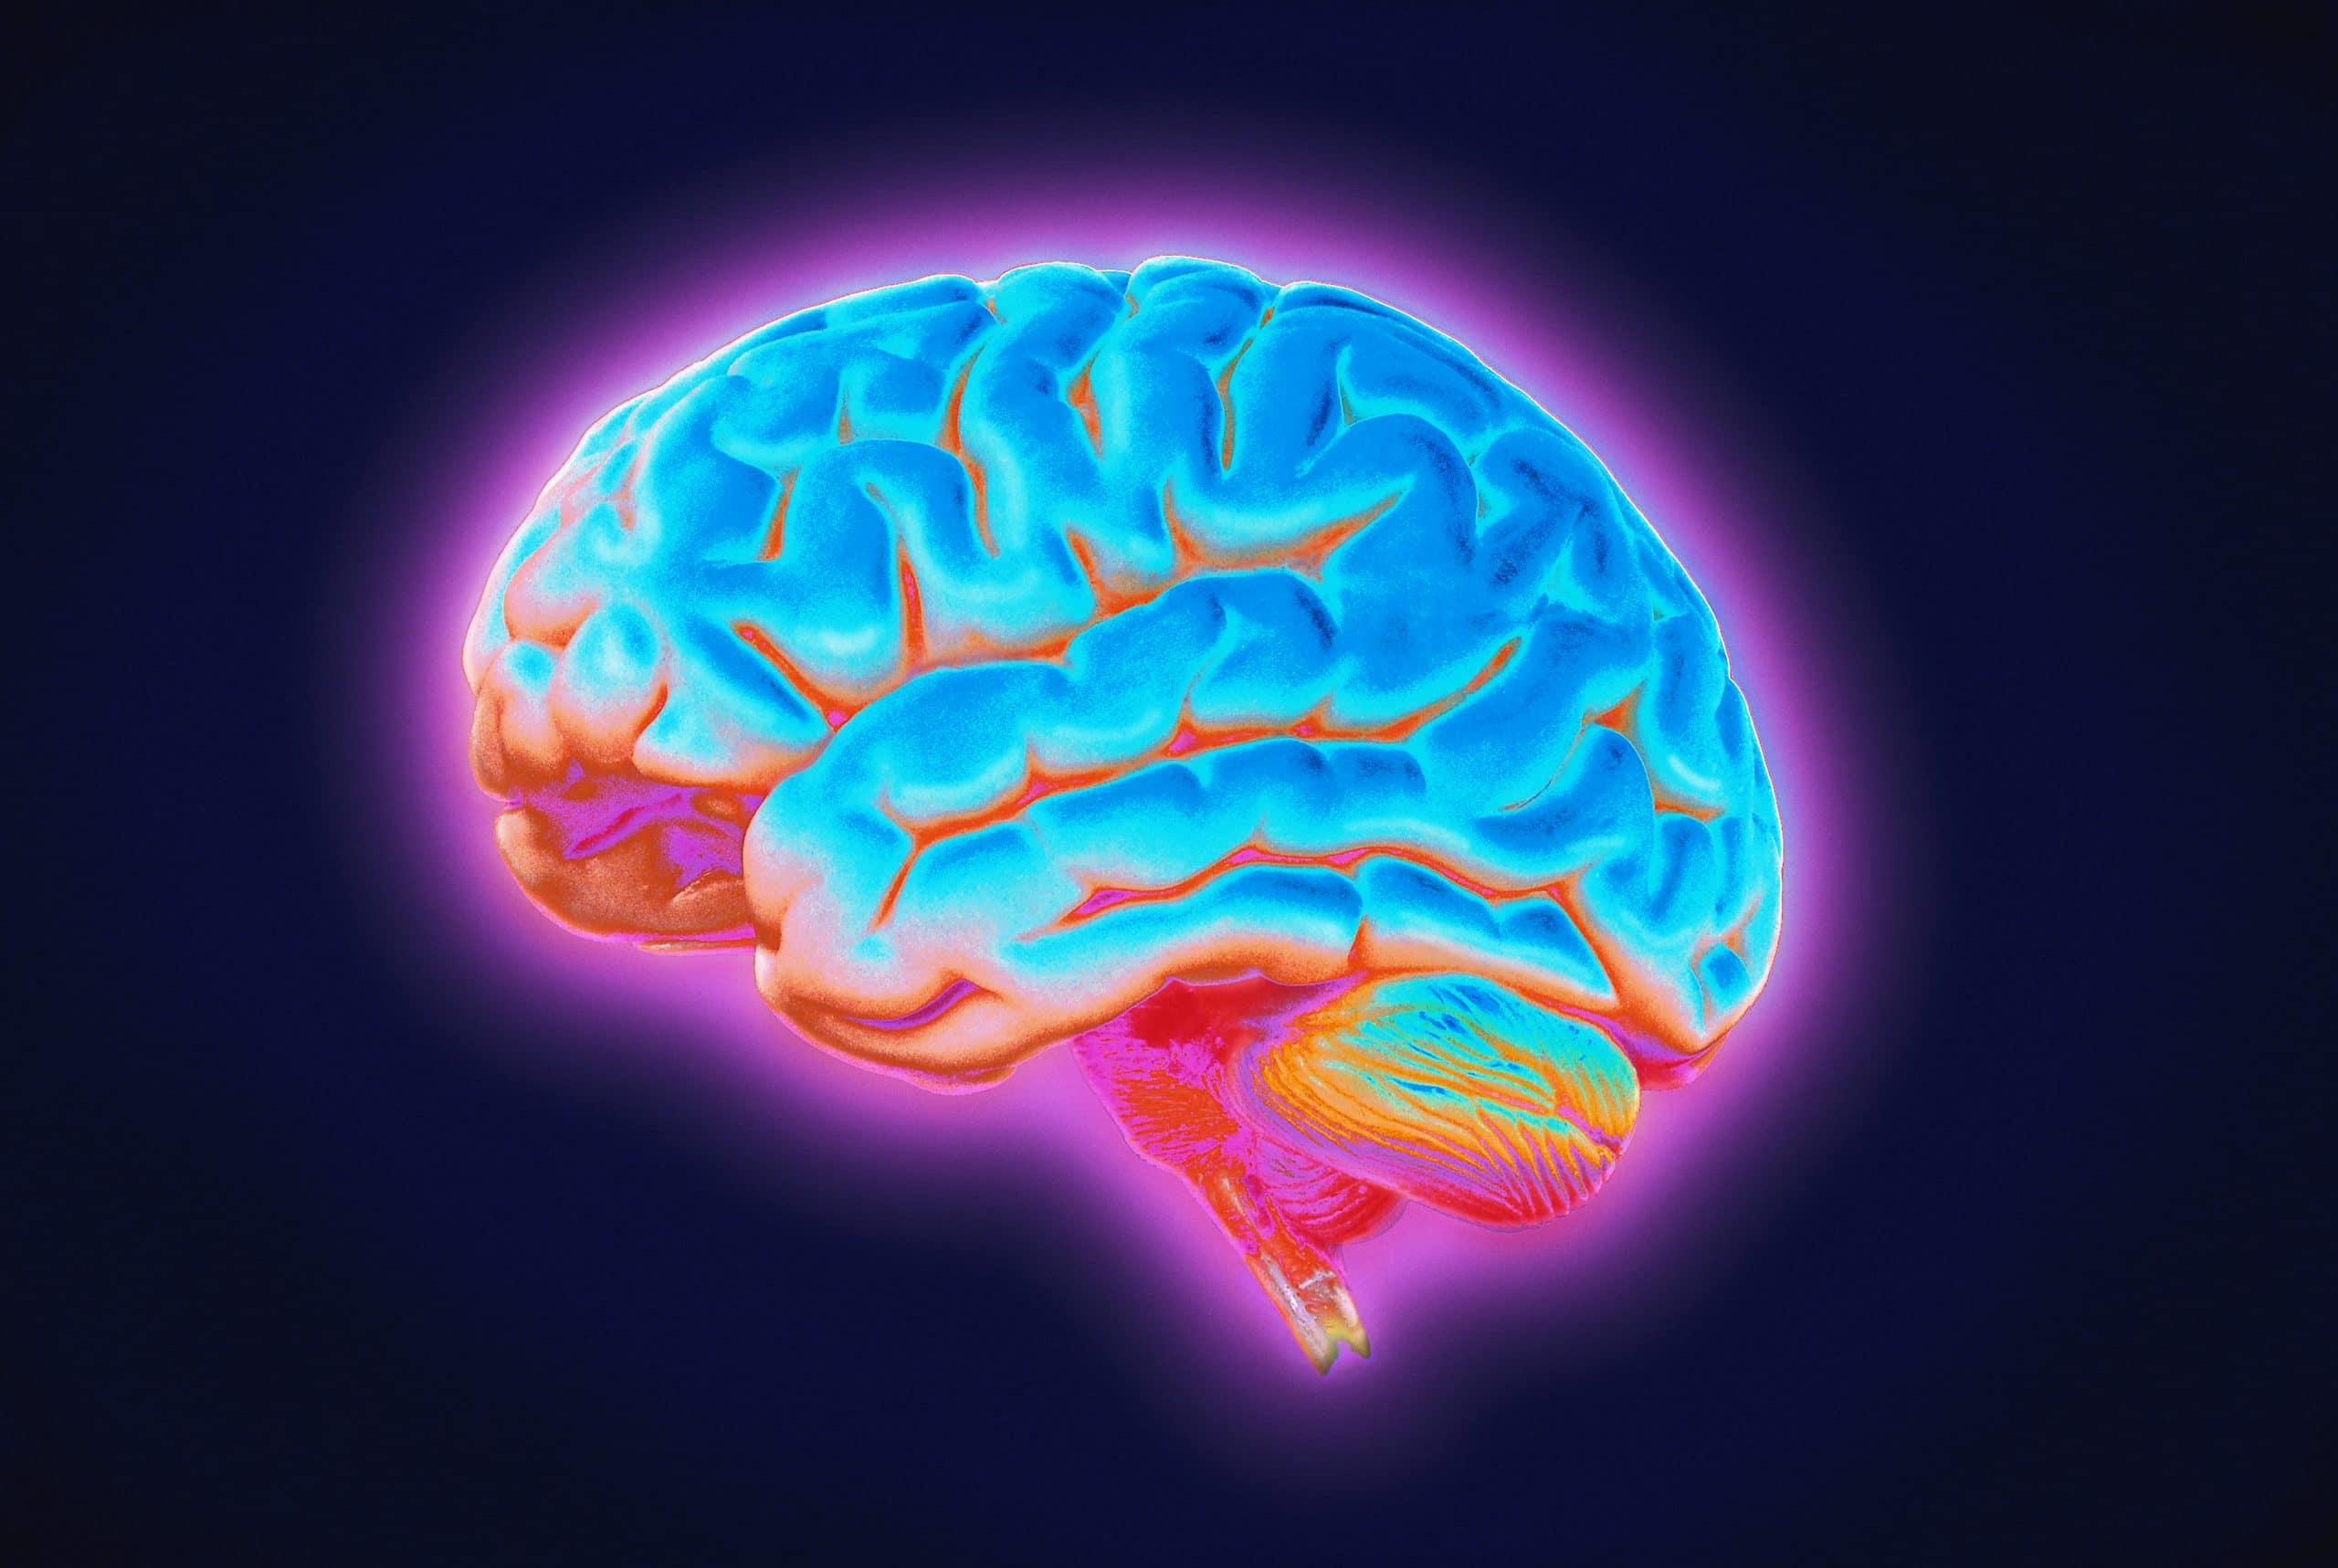 Saúde mental durante o coronavírus